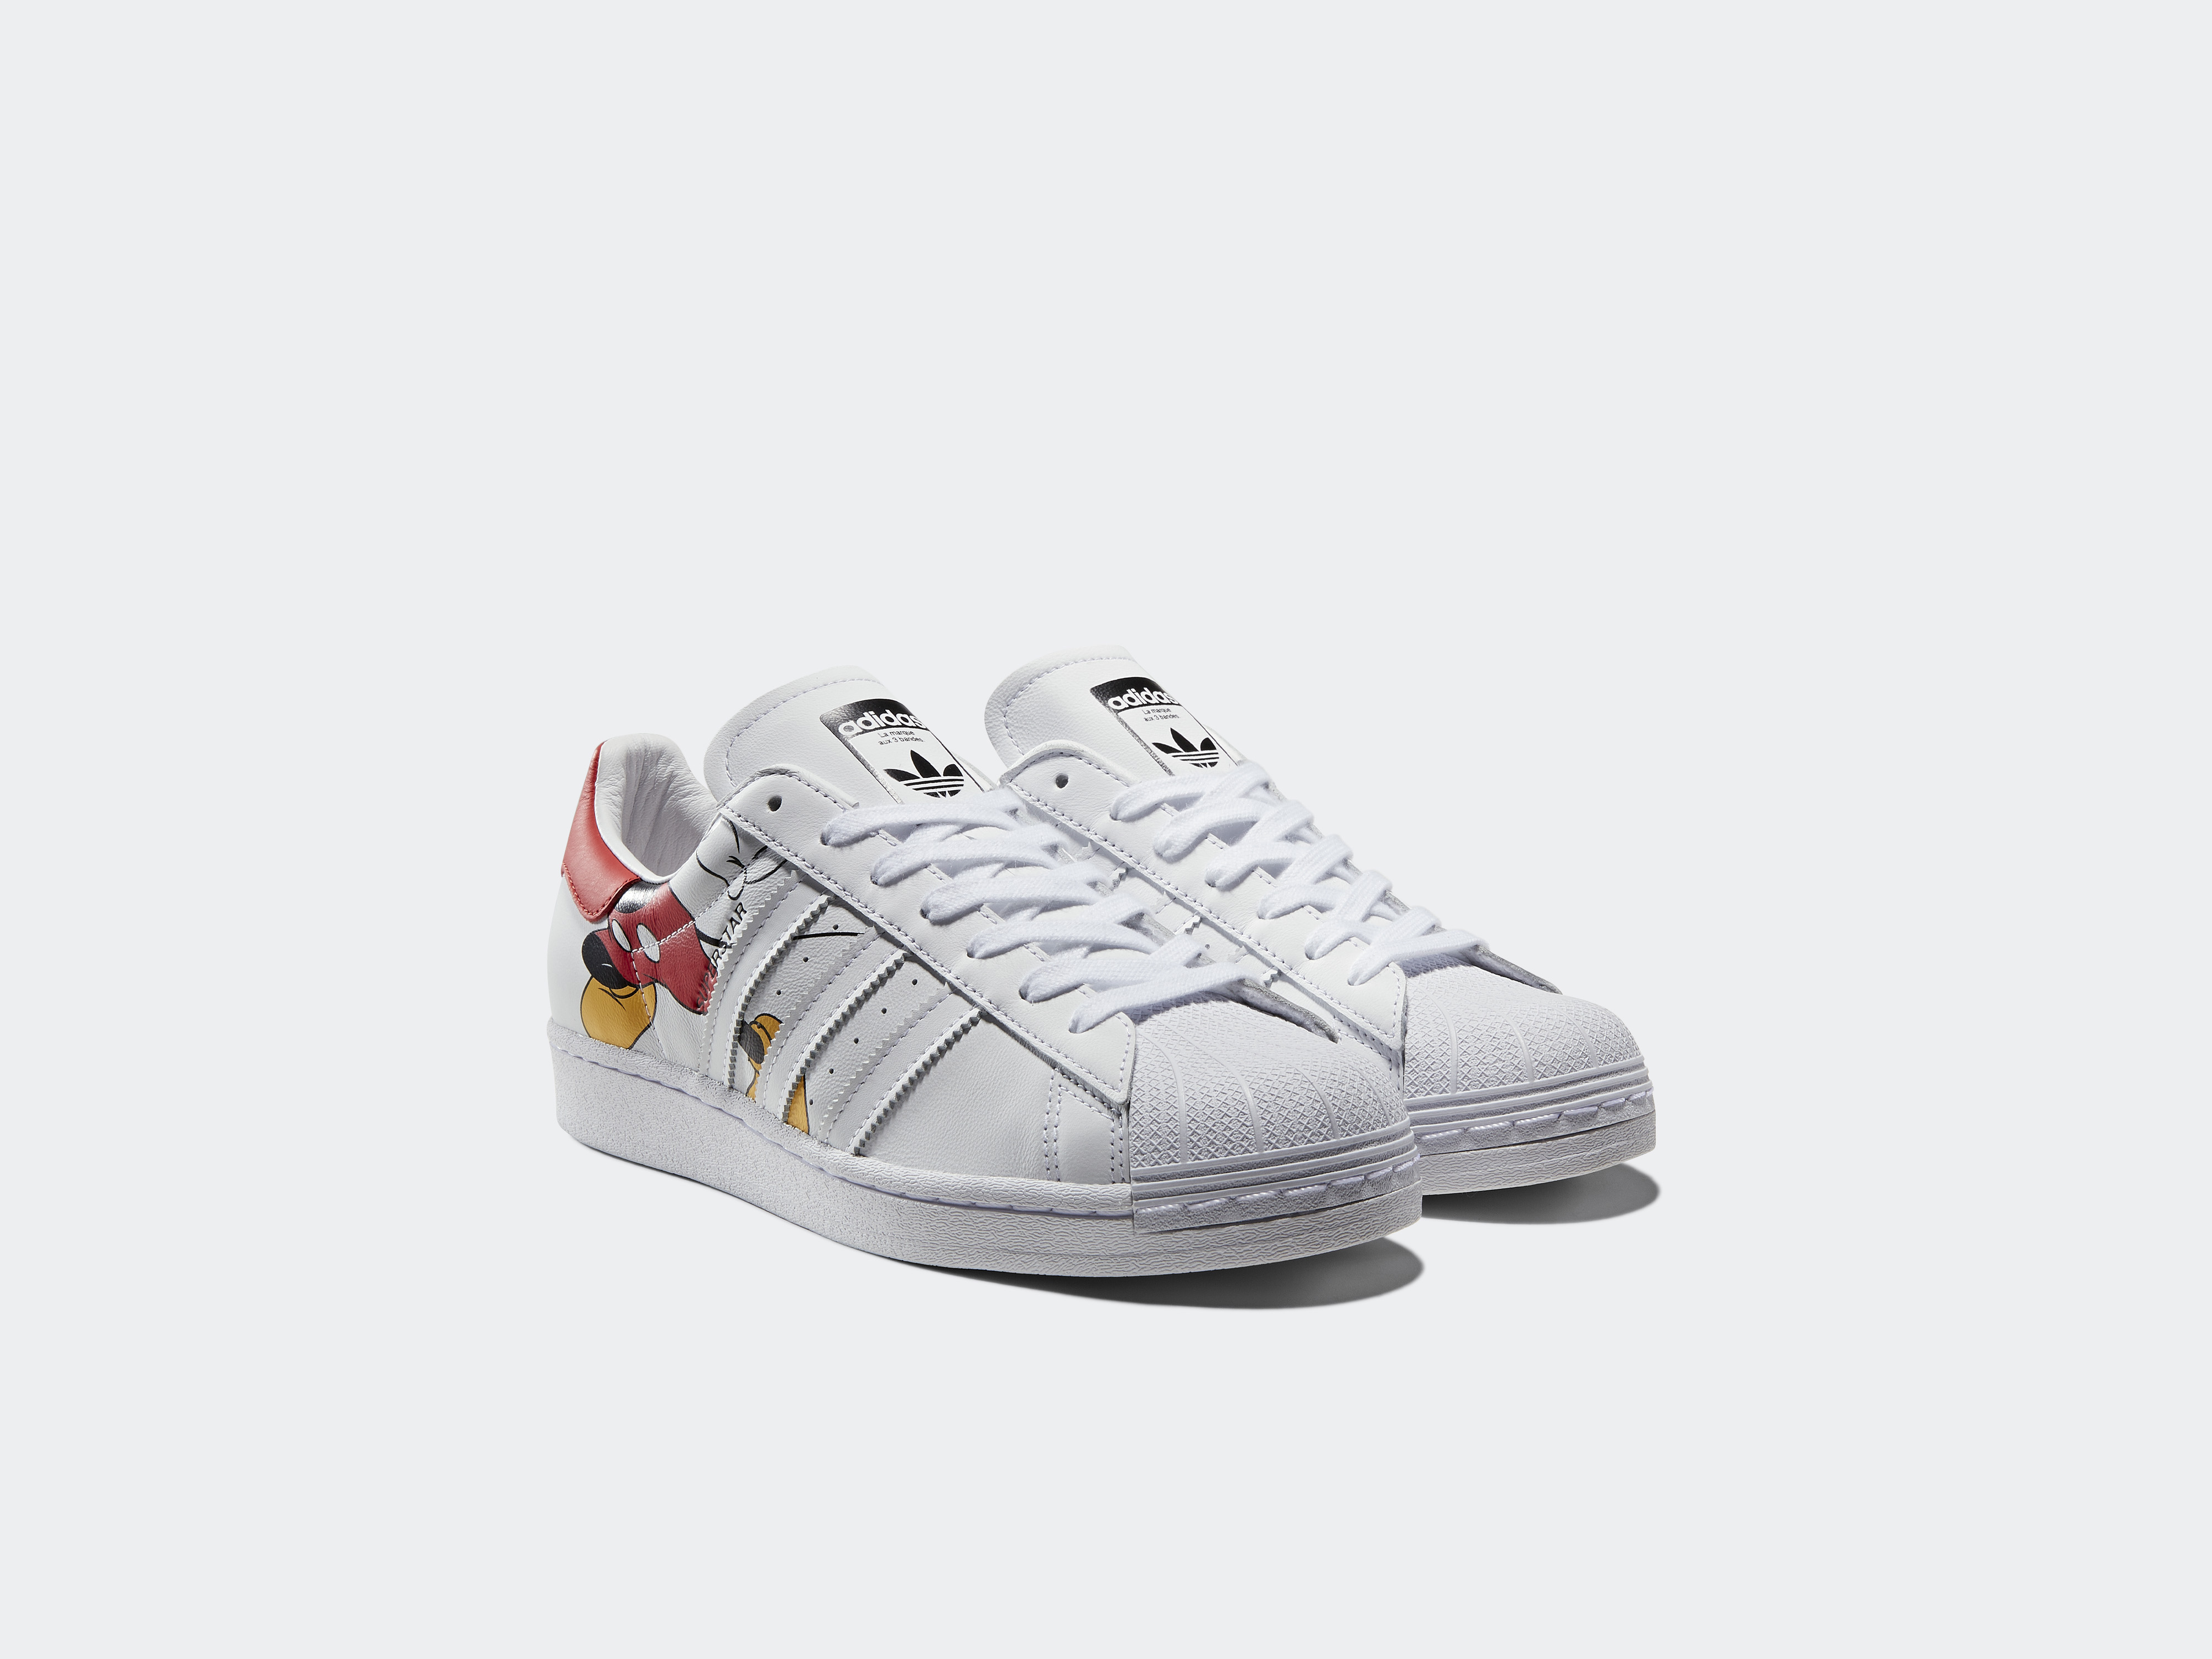 Avis : que vaut la Adidas Stan Smith CNY Disney Mickey Mouse